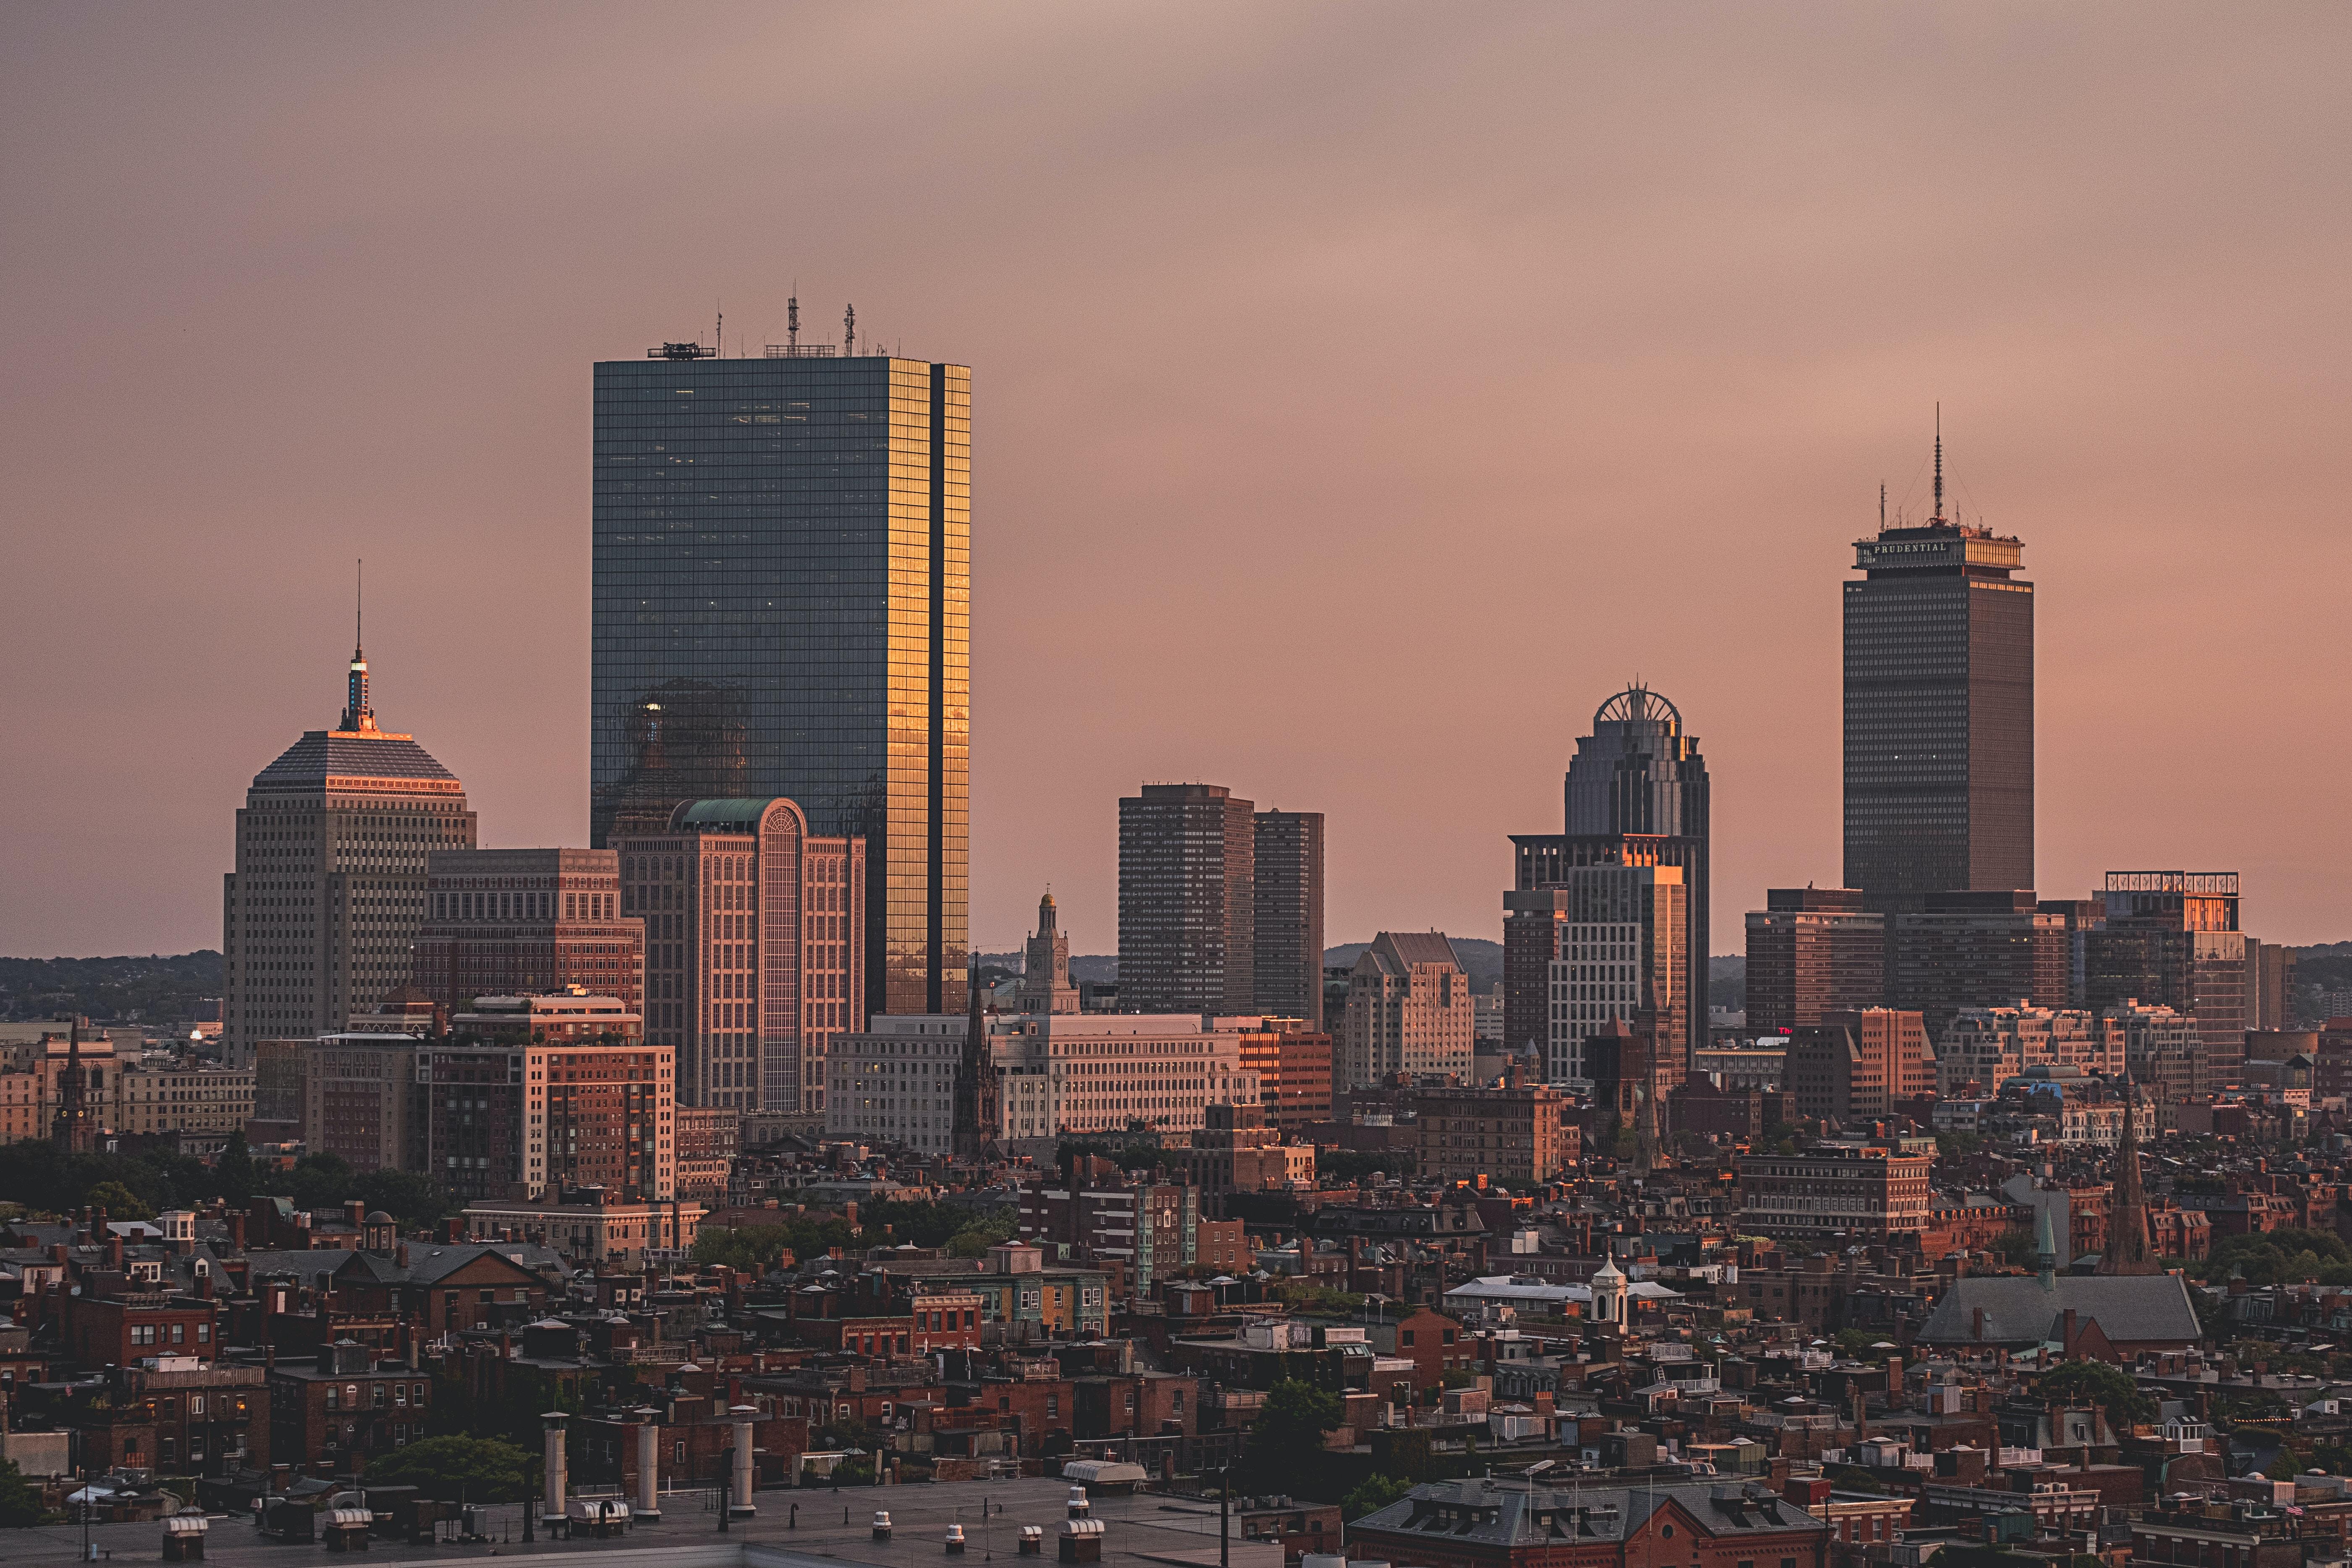 Top 40+ Pharmaceutical Companies In Boston In 2021